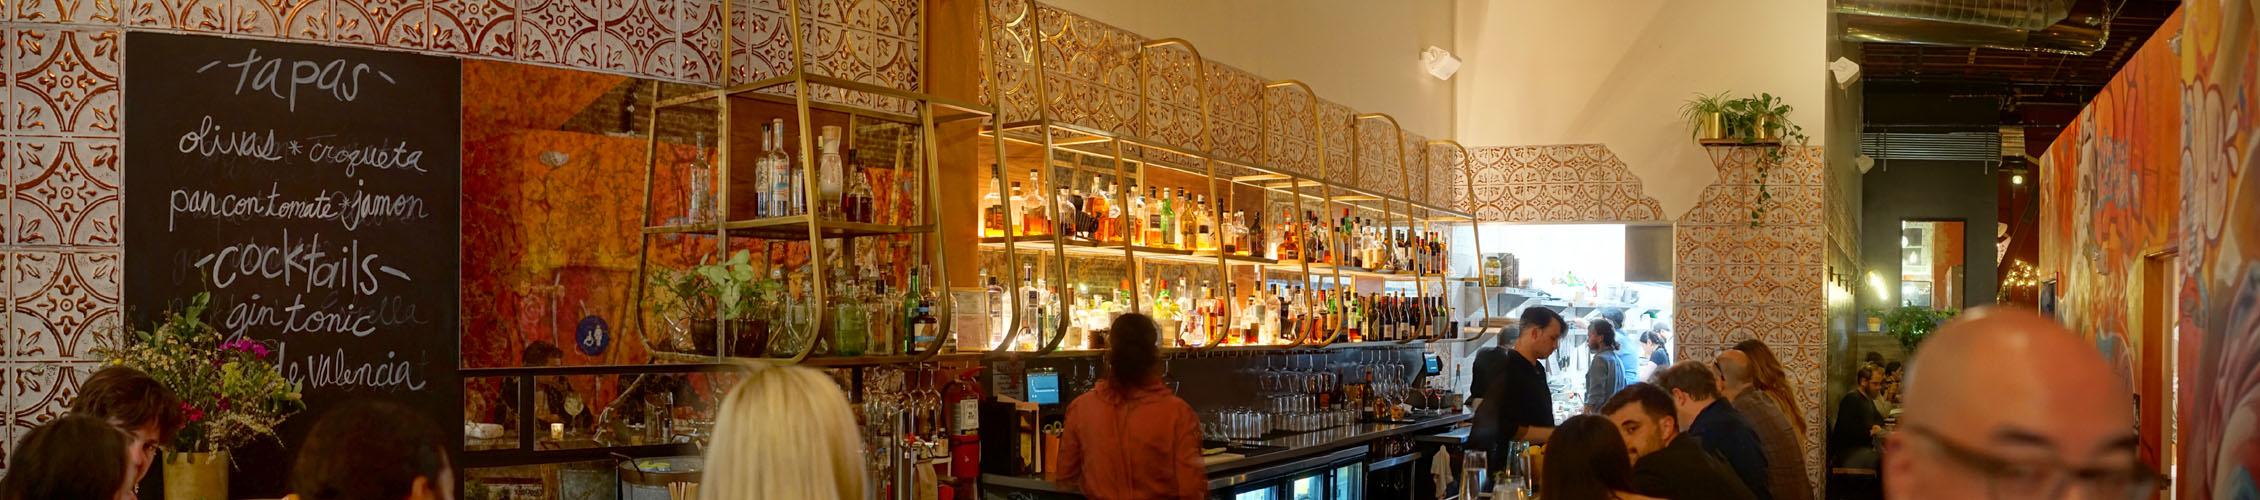 Otoño Bar Area